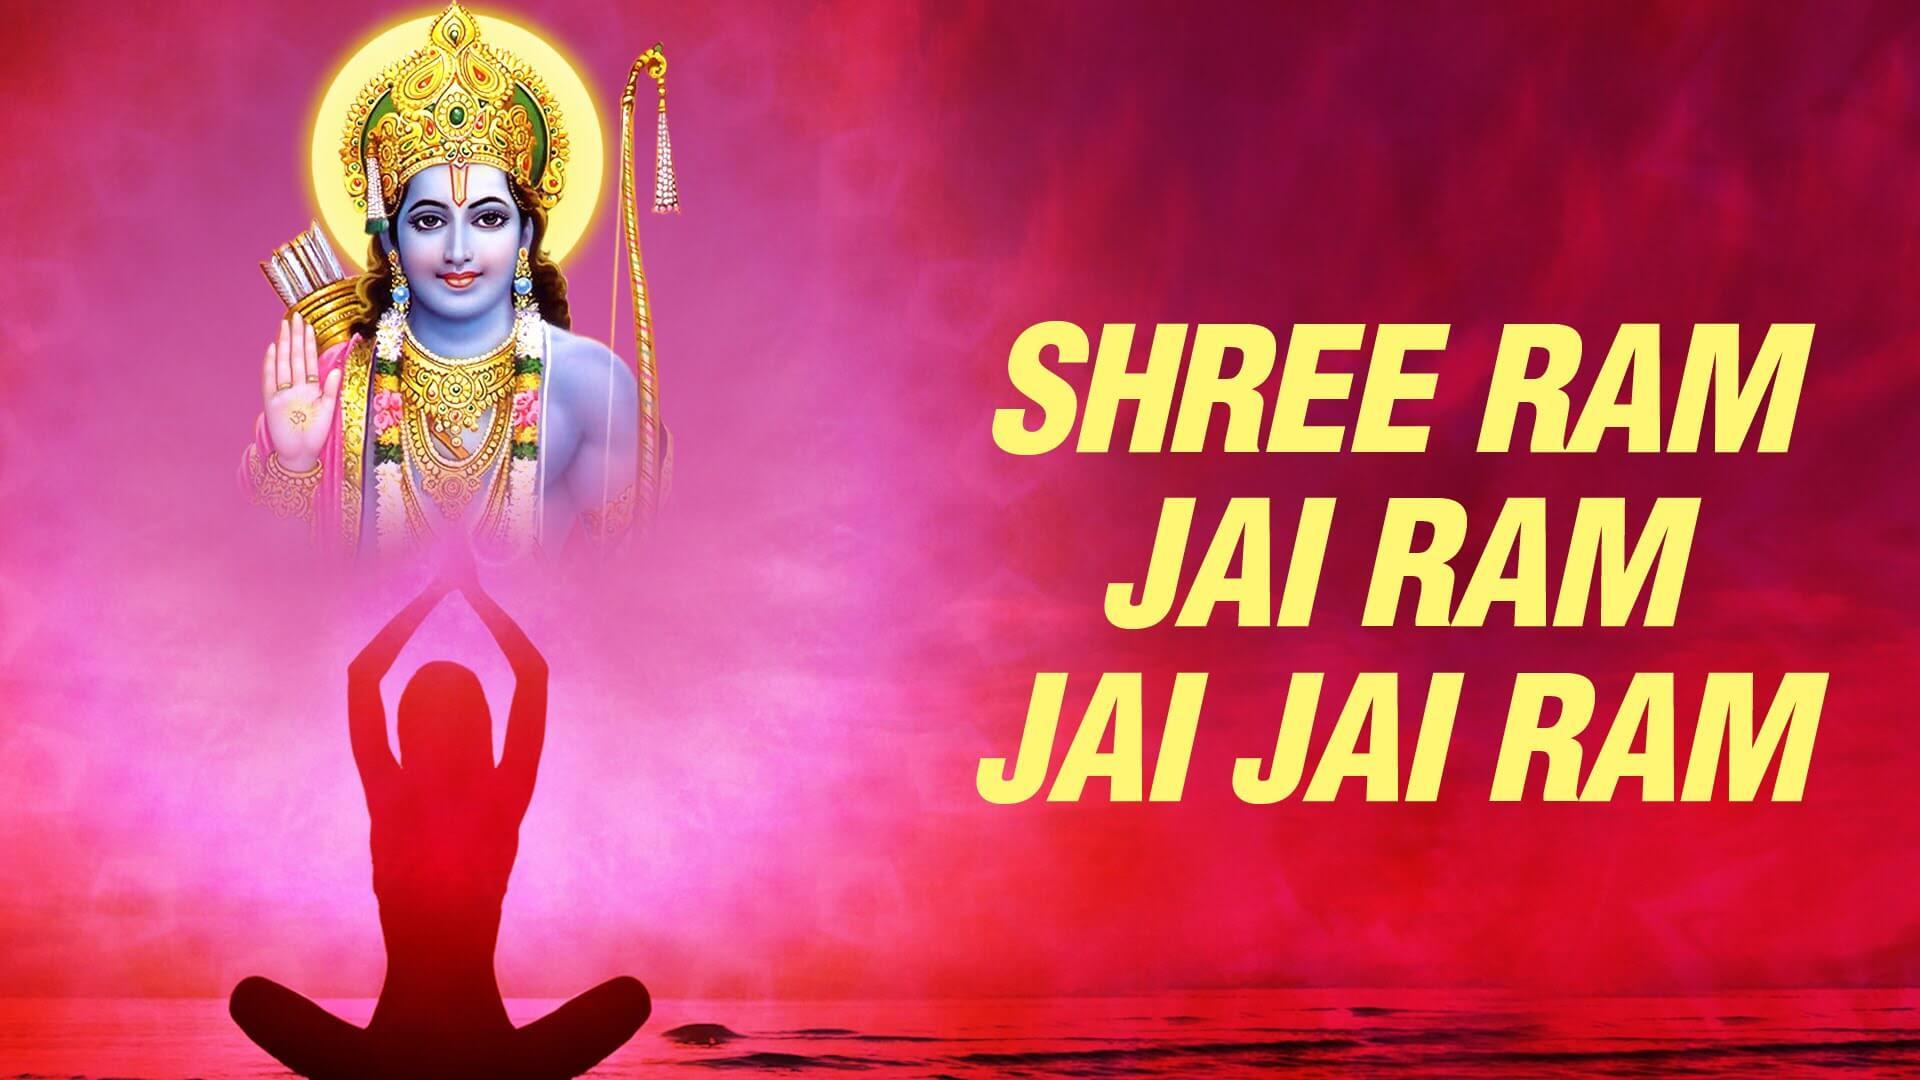 Bhagwan Shree Ram JI Mantra | Ayodhyapati Bhagwan Shri Ram Mantra